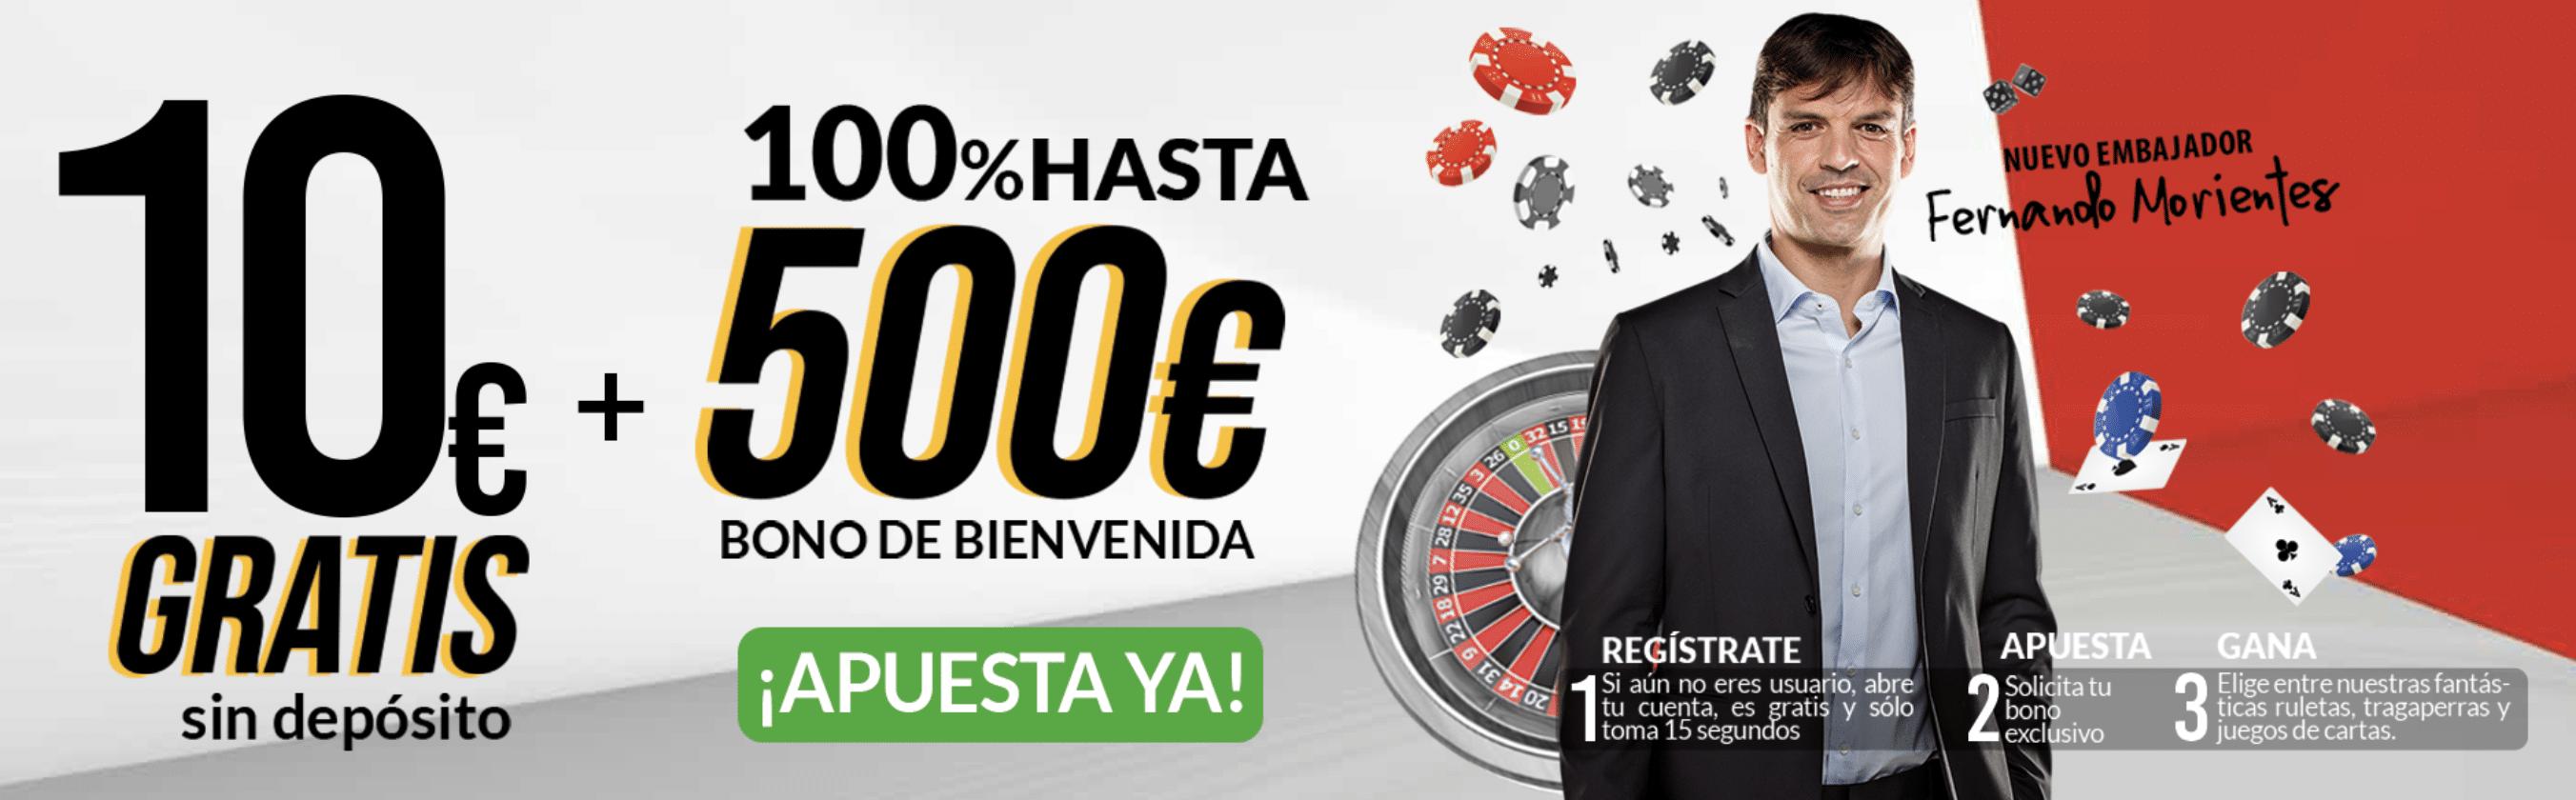 Bono casino paf online confiable Guyana 109676